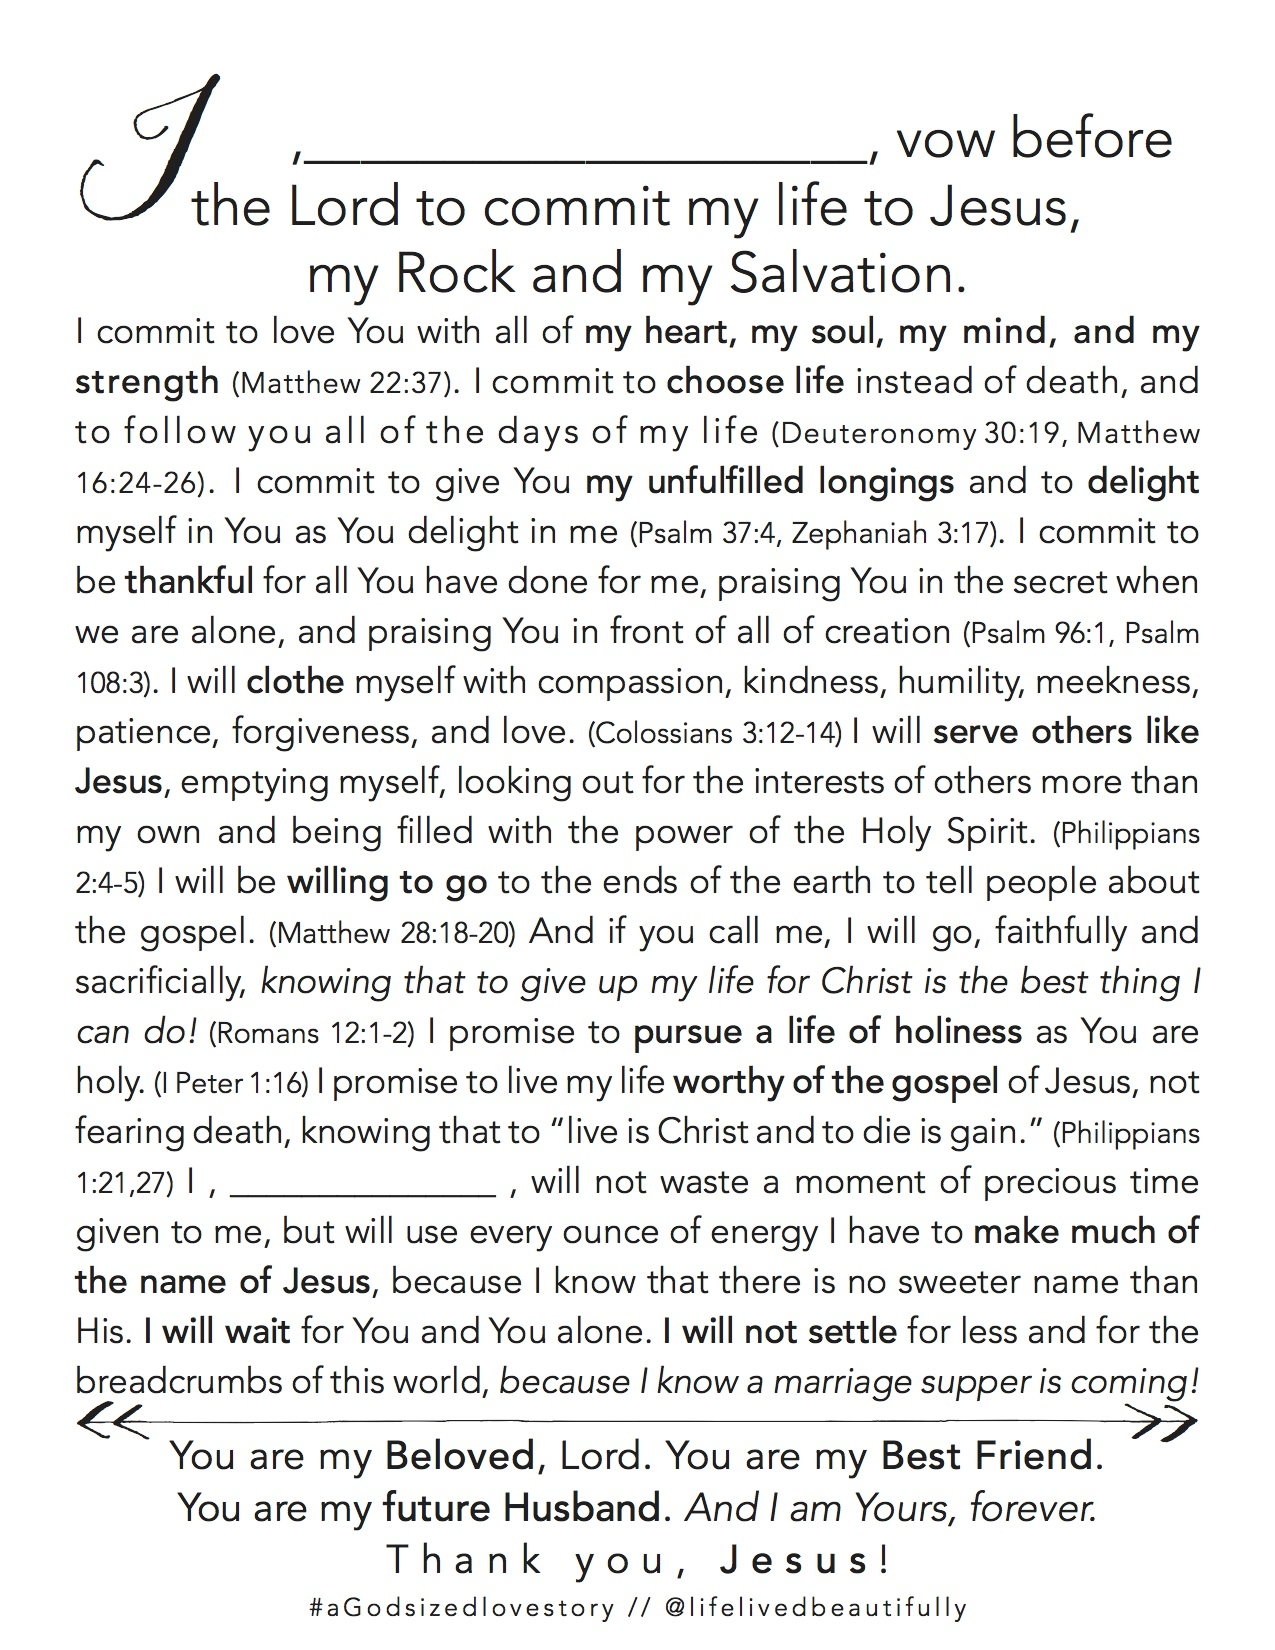 Vows to Jesus